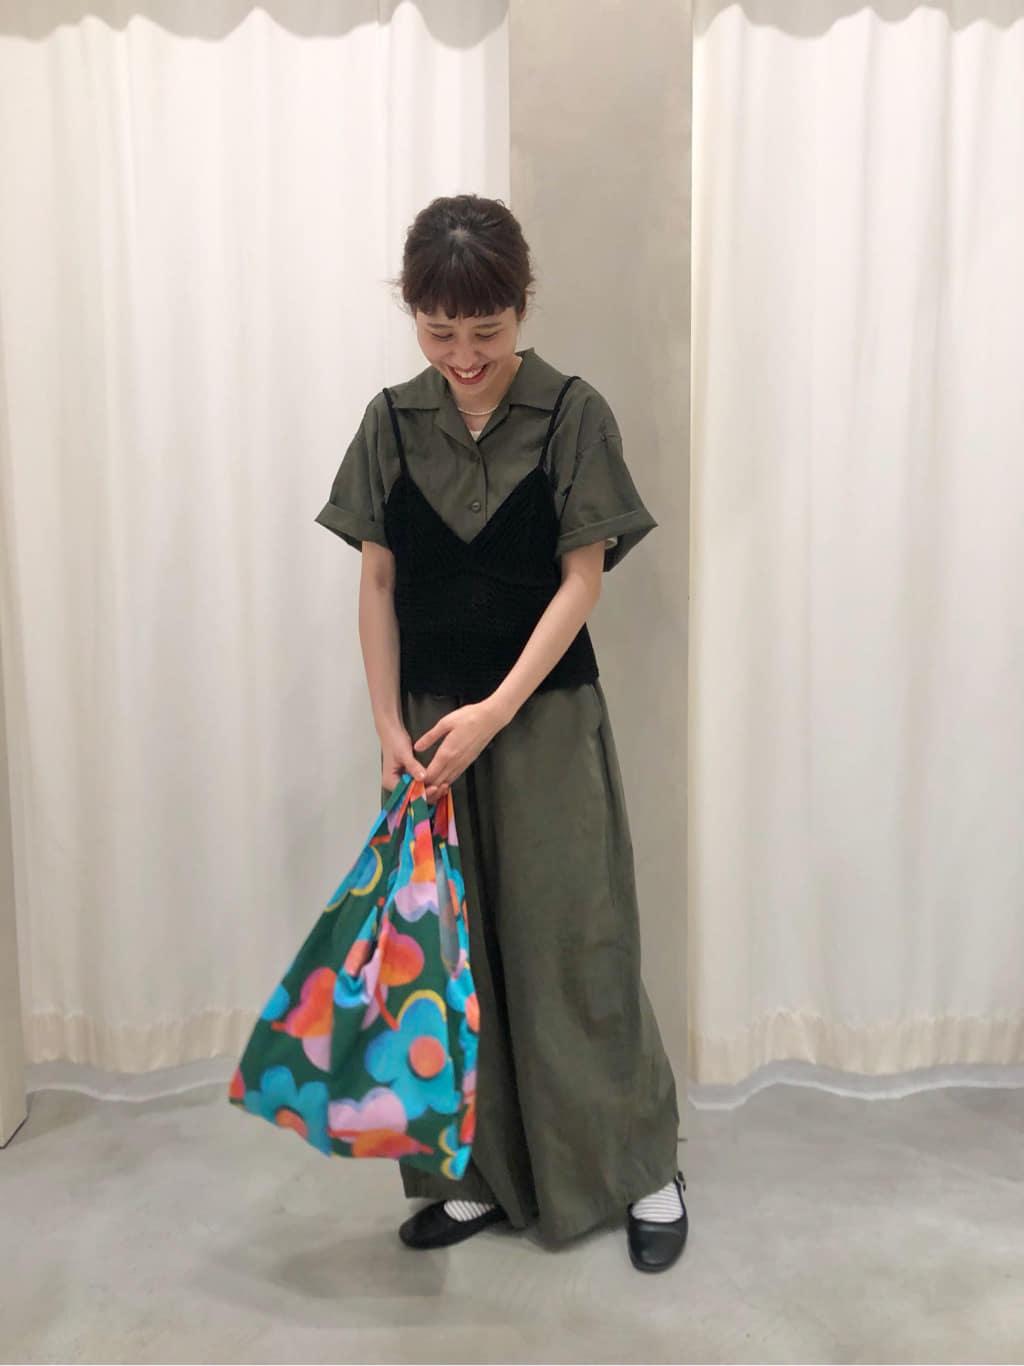 - CHILD WOMAN CHILD WOMAN , PAR ICI 東京スカイツリータウン・ソラマチ 身長:160cm 2021.08.06